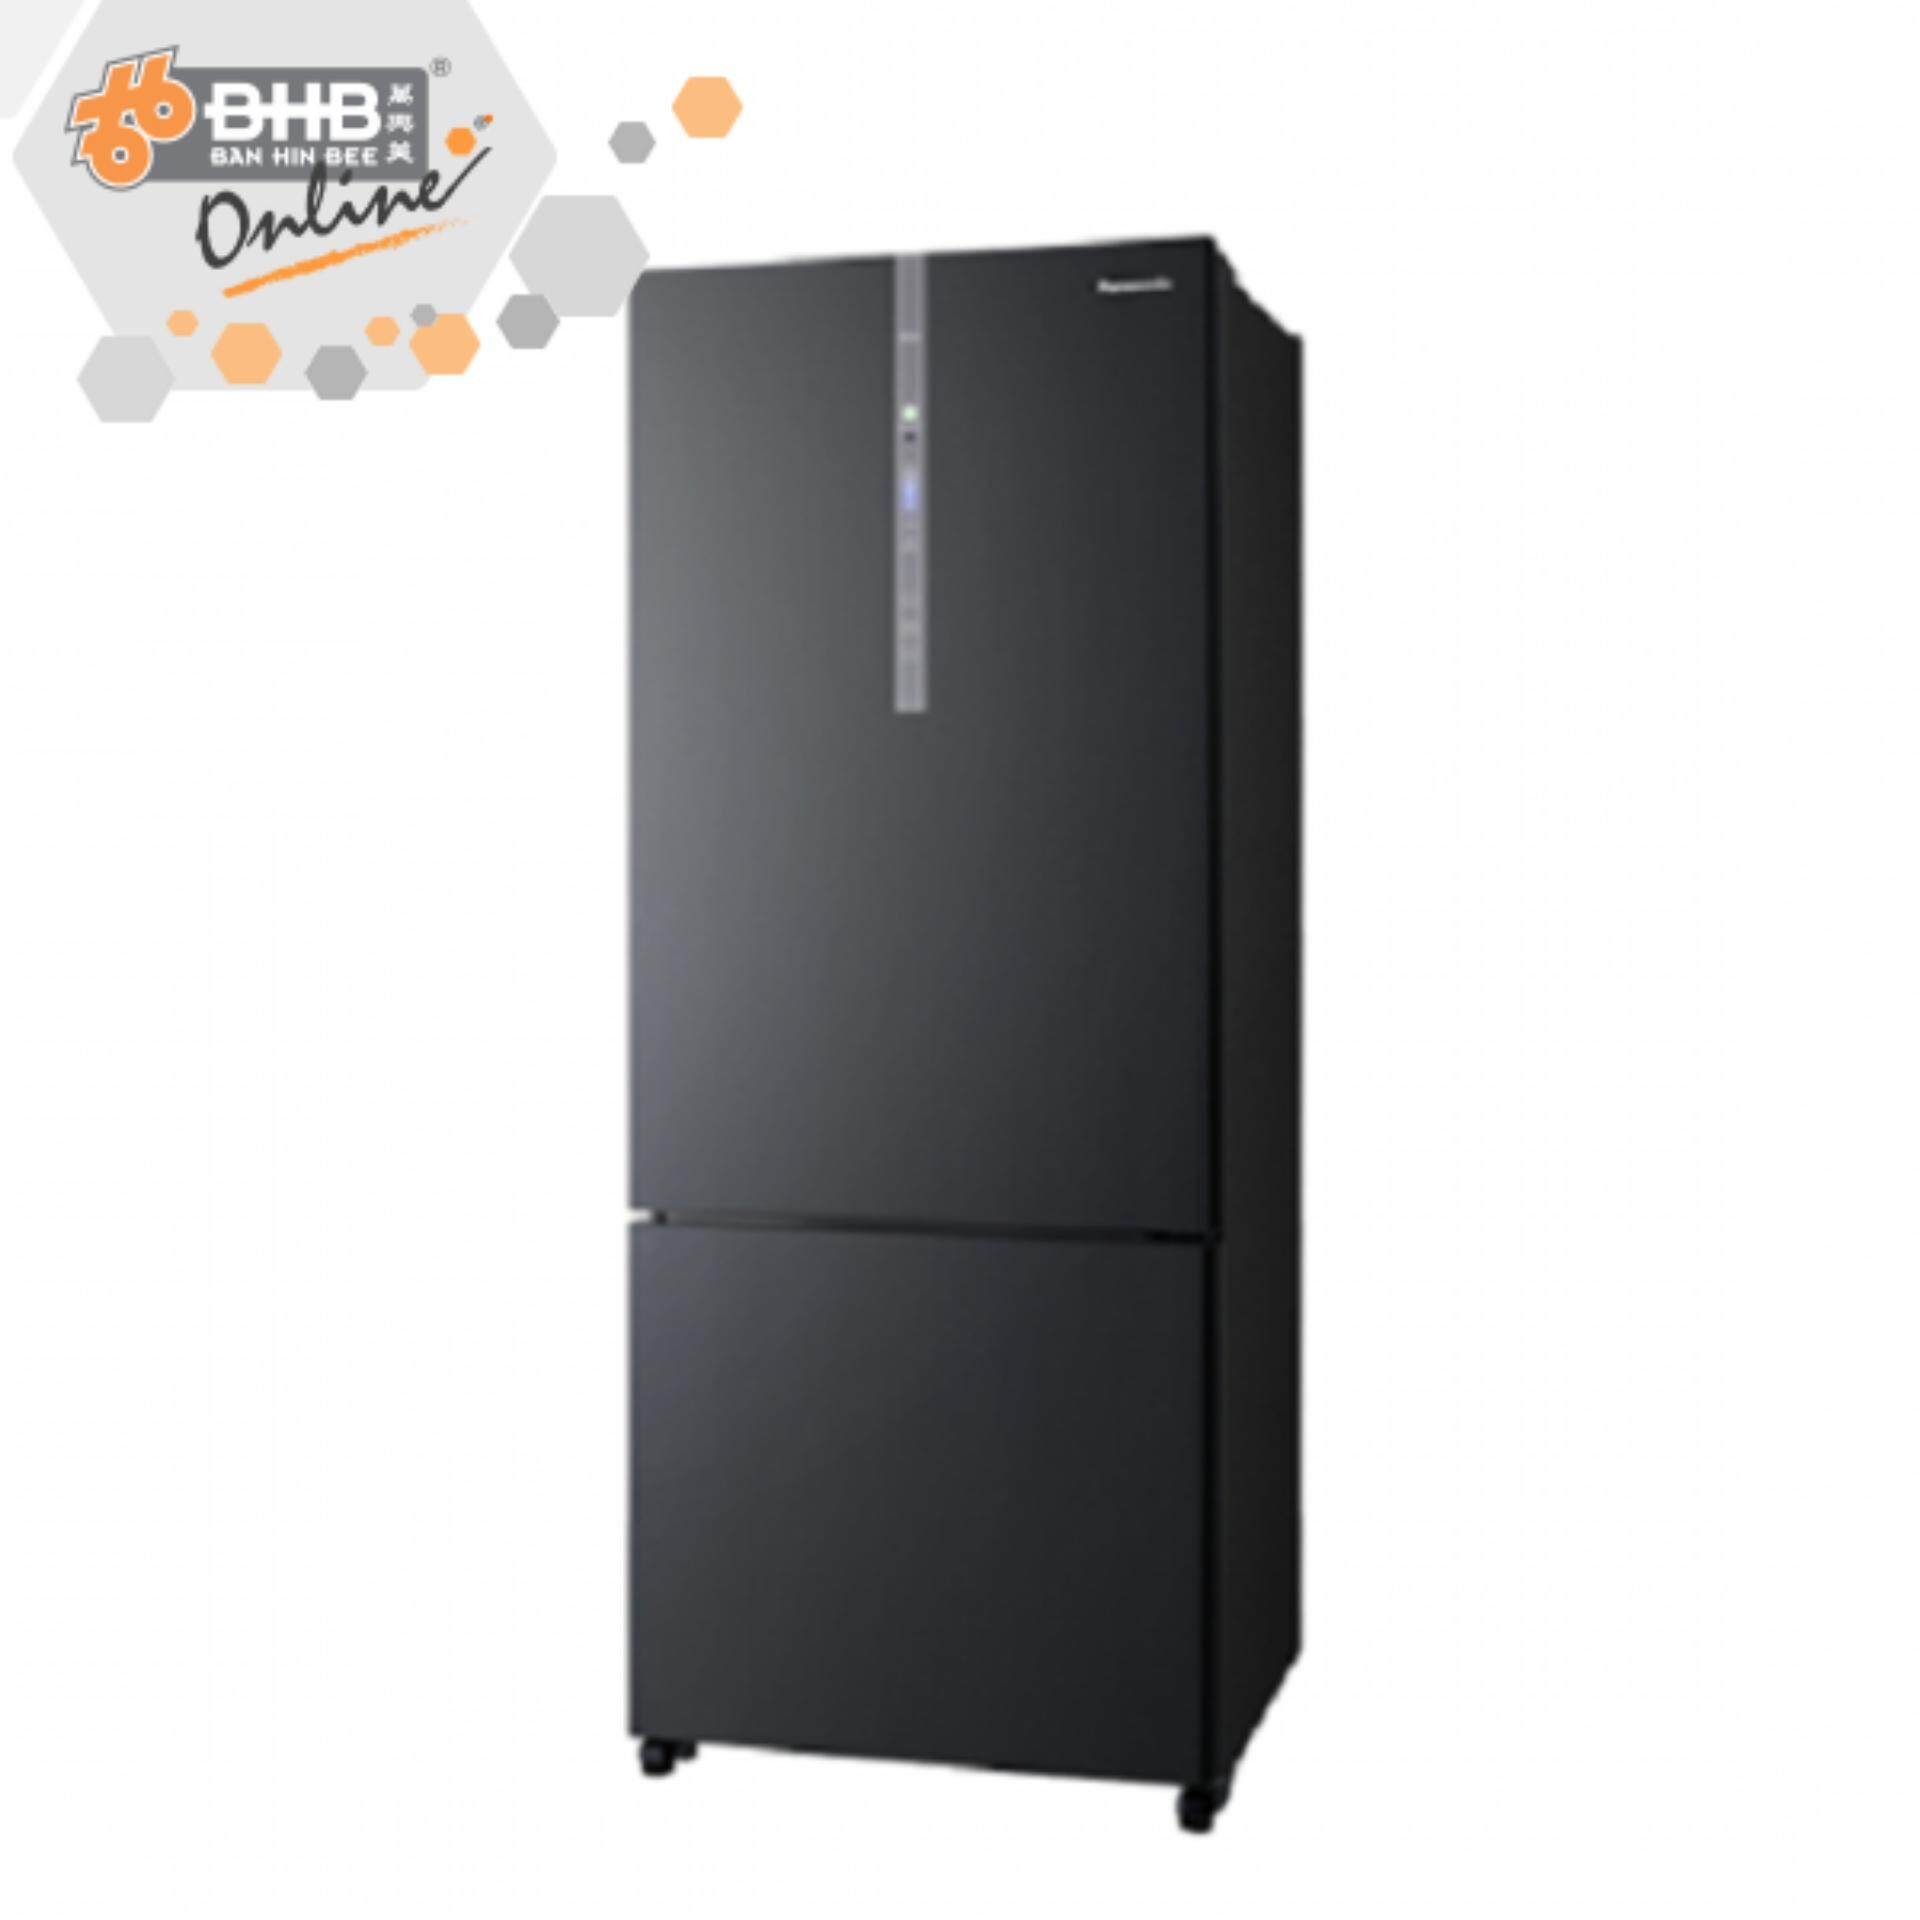 Panasonic NRBX468GK Fridge 2D 450L [Black] Inverter